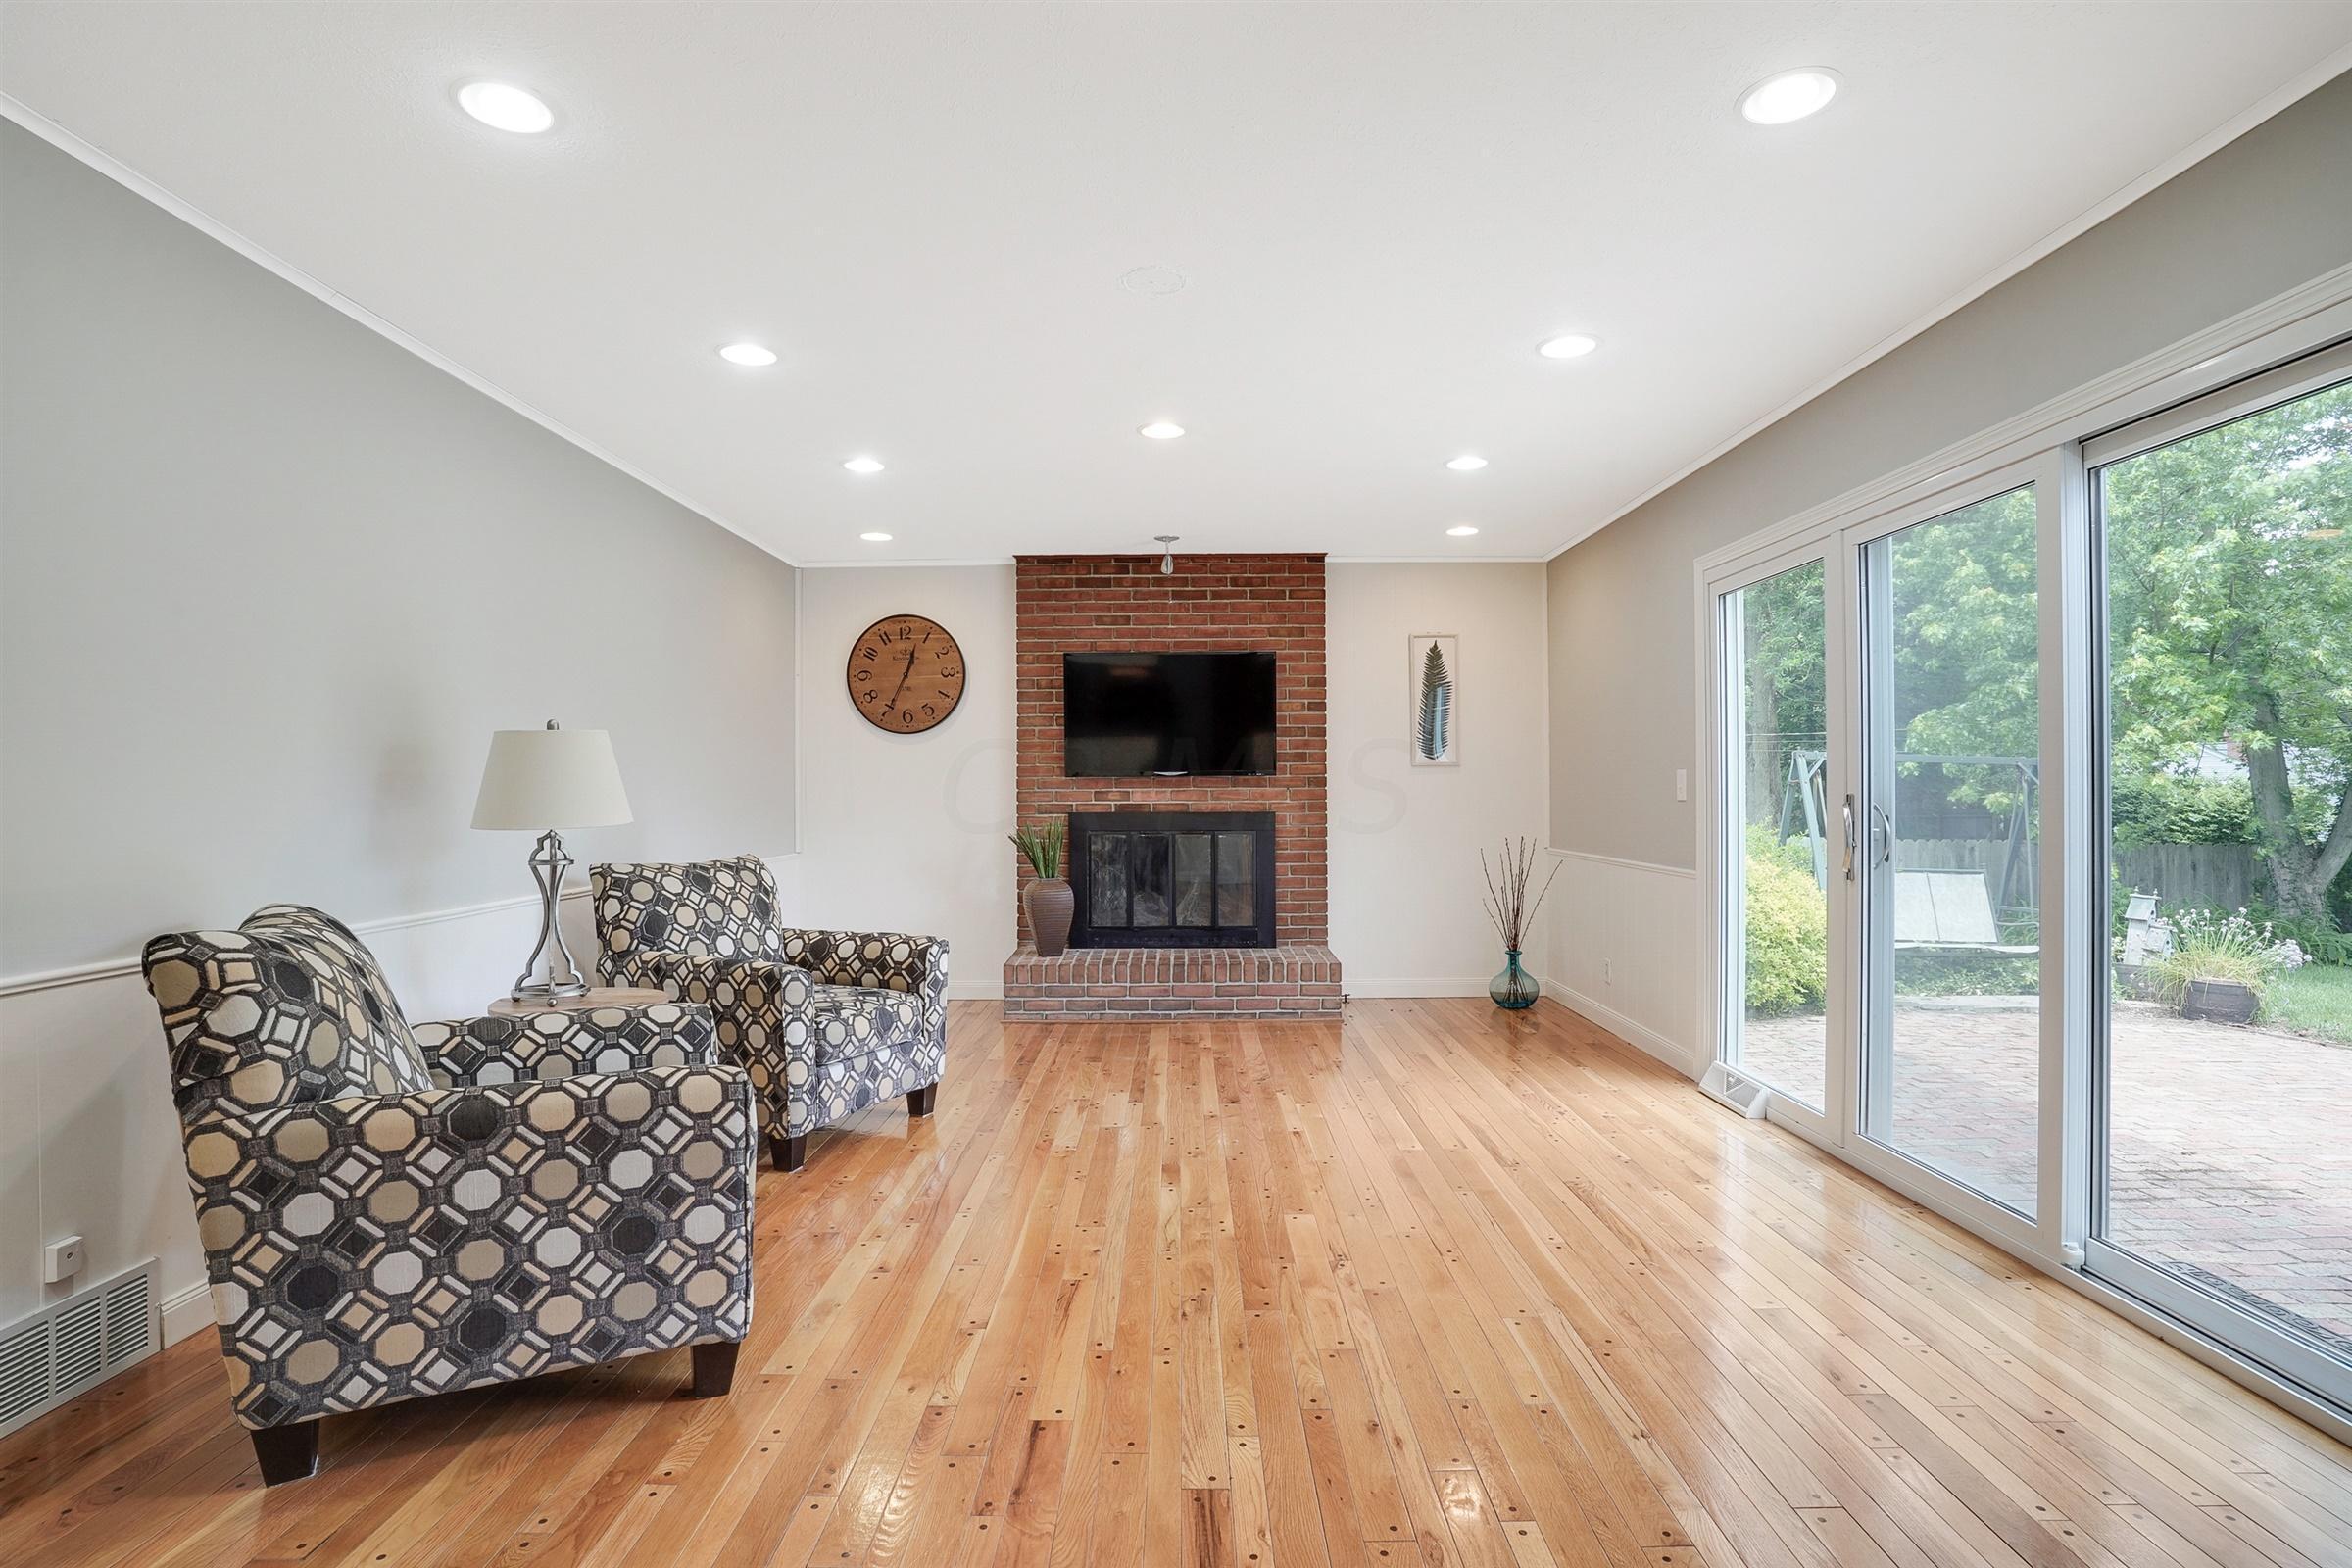 2026 Fishinger Road, Columbus, Ohio 43221, 4 Bedrooms Bedrooms, ,3 BathroomsBathrooms,Residential,For Sale,Fishinger,220017702